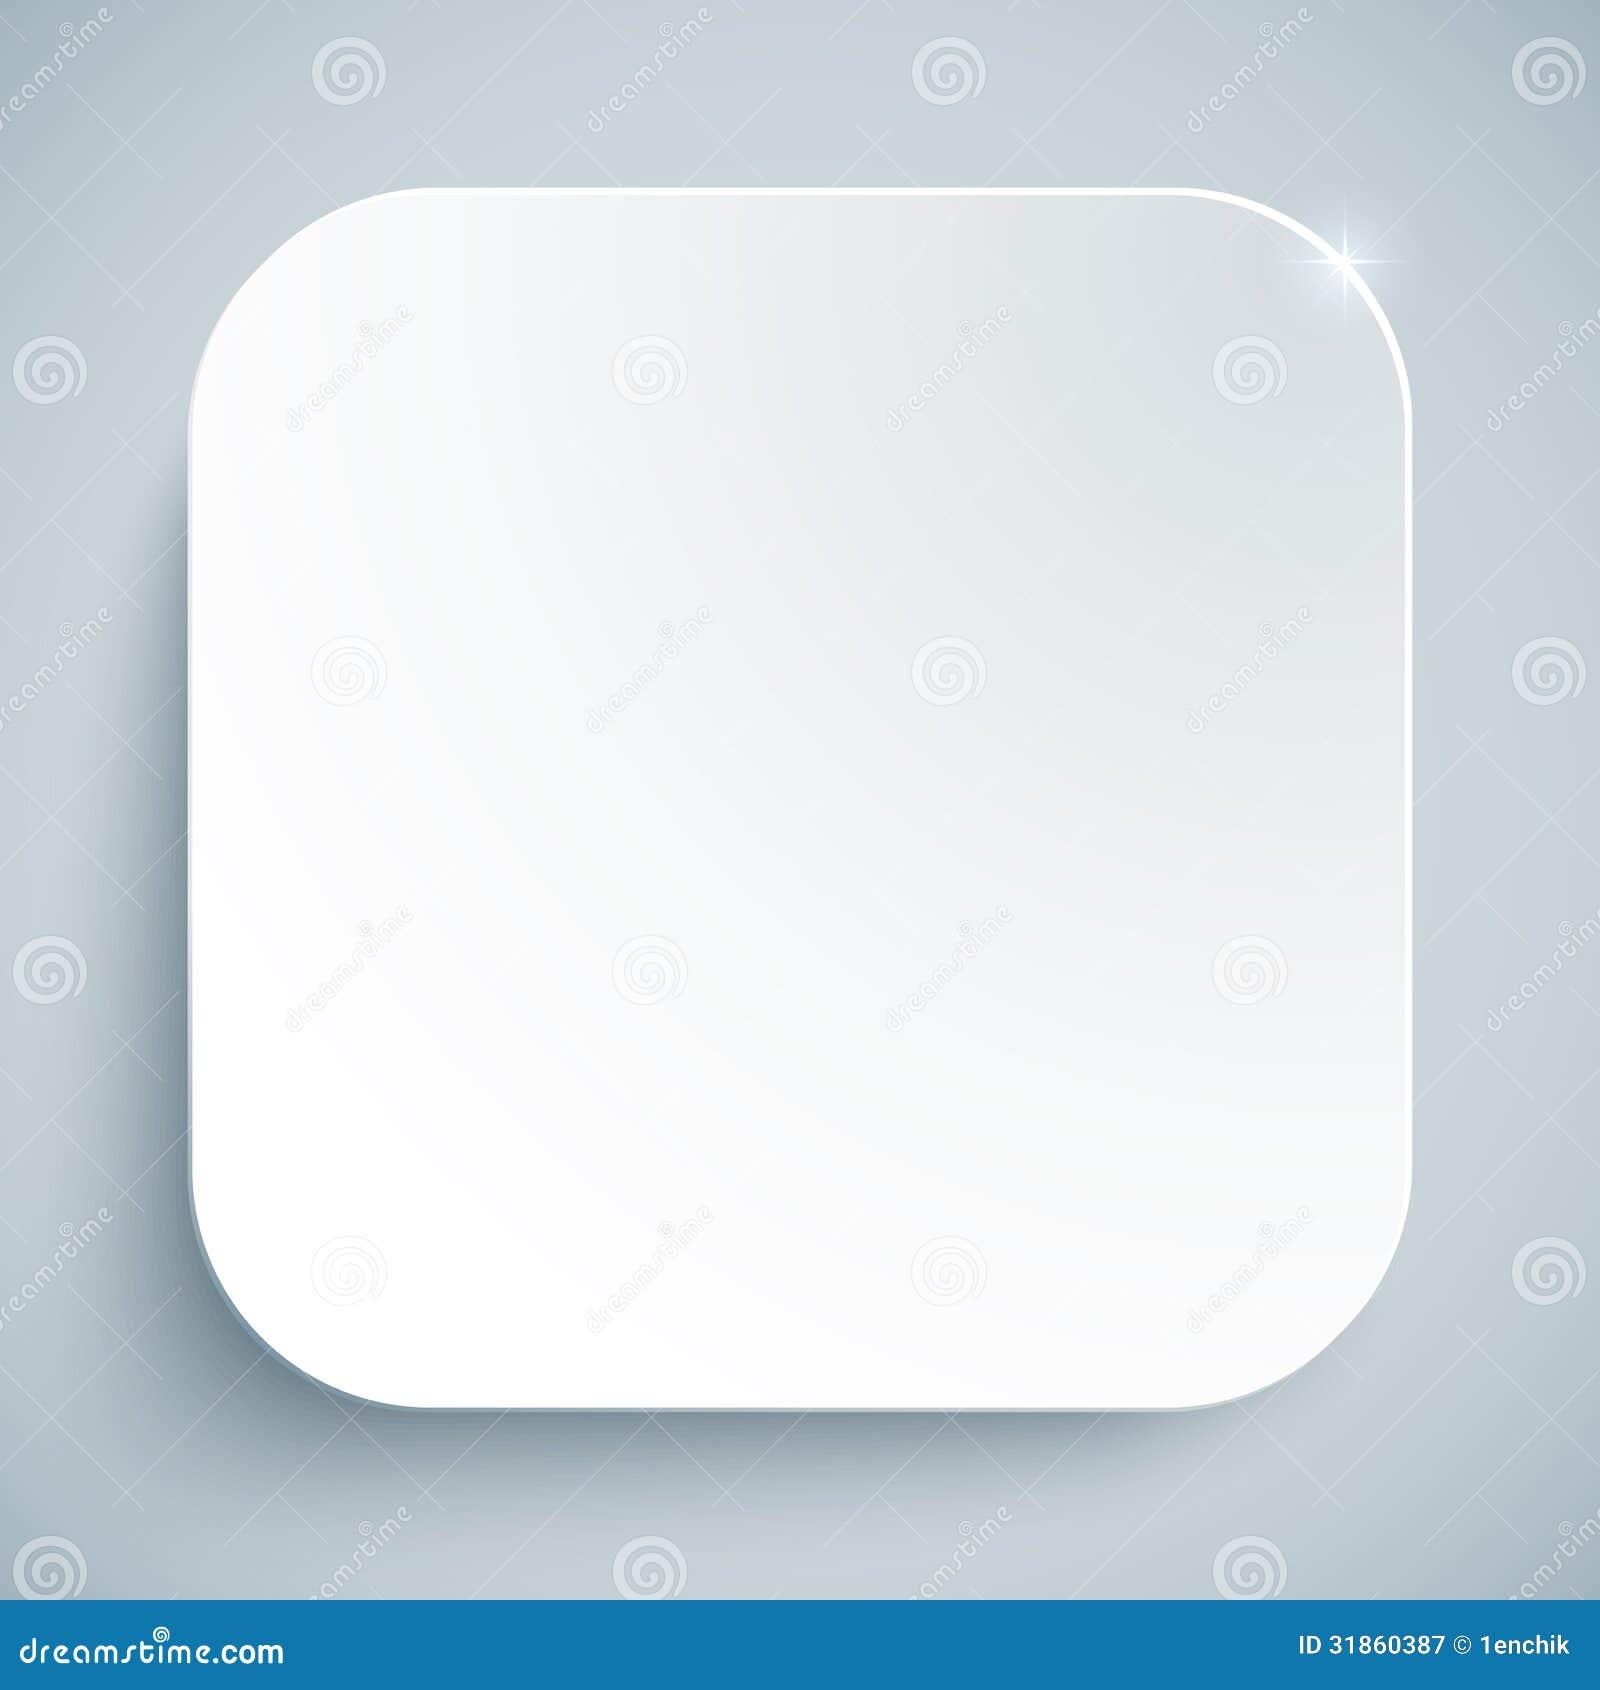 blank restaurant menu template